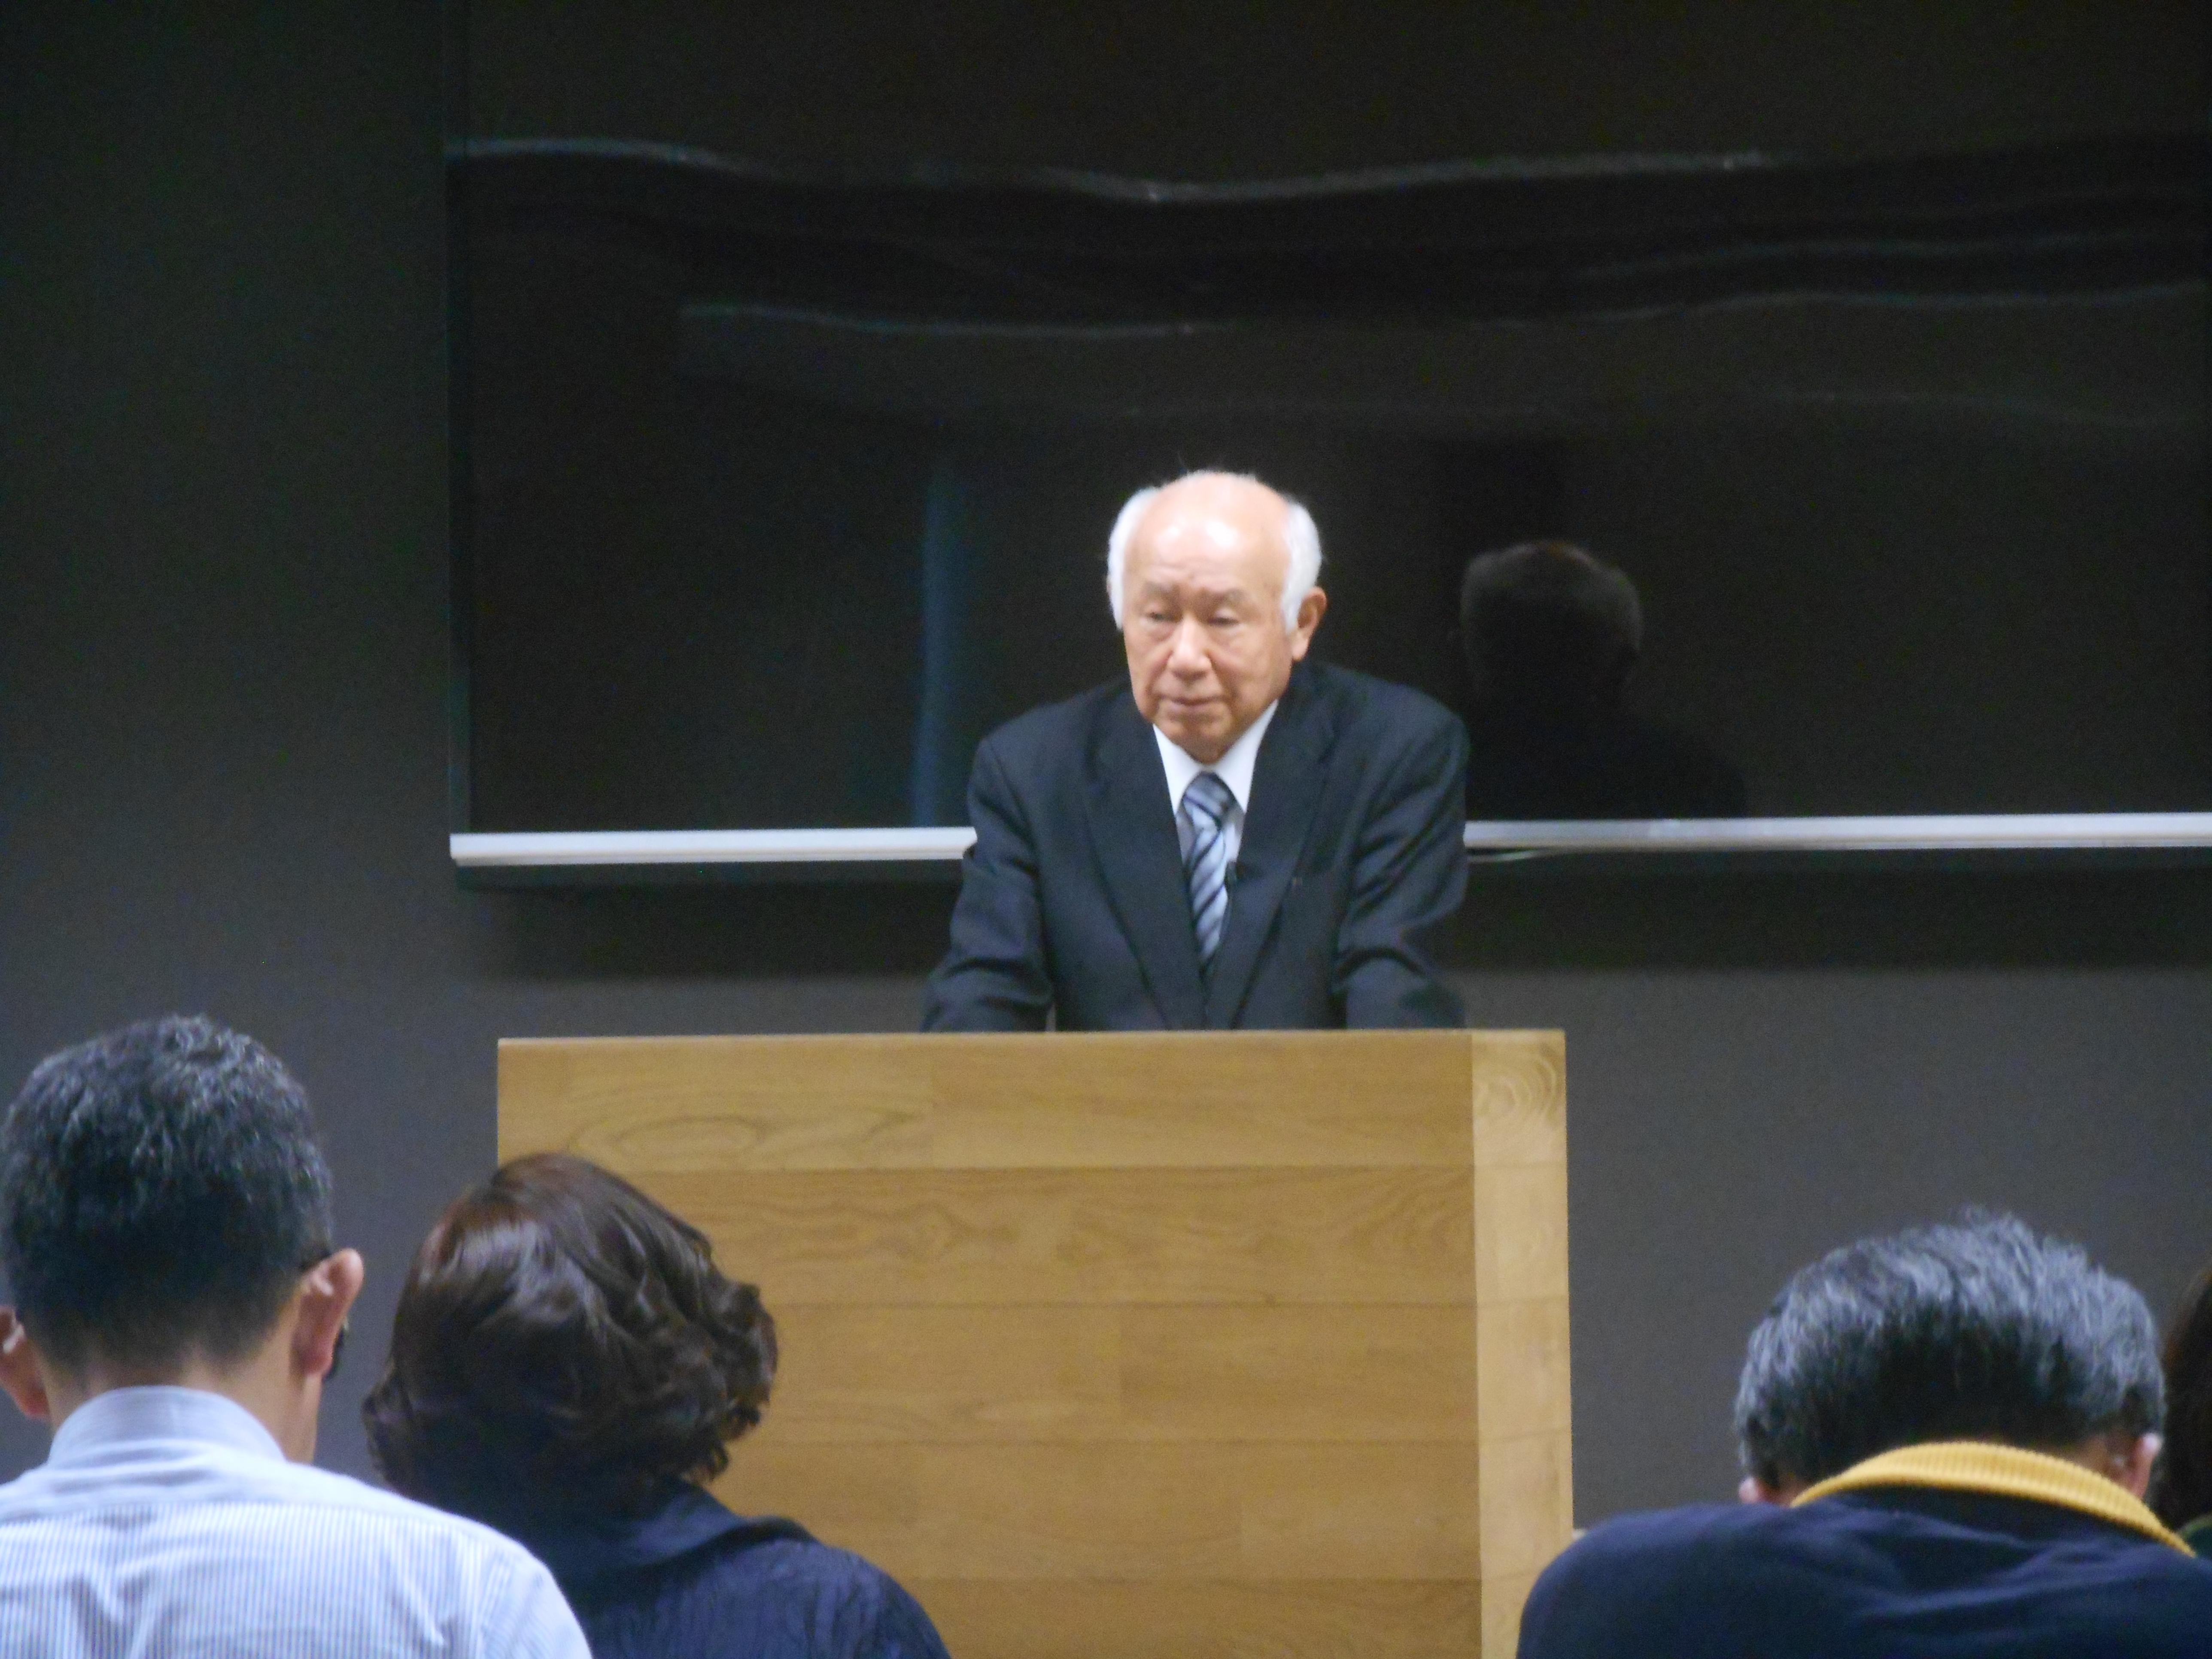 DSCN0445 - 2017年2月4日東京思風塾開催